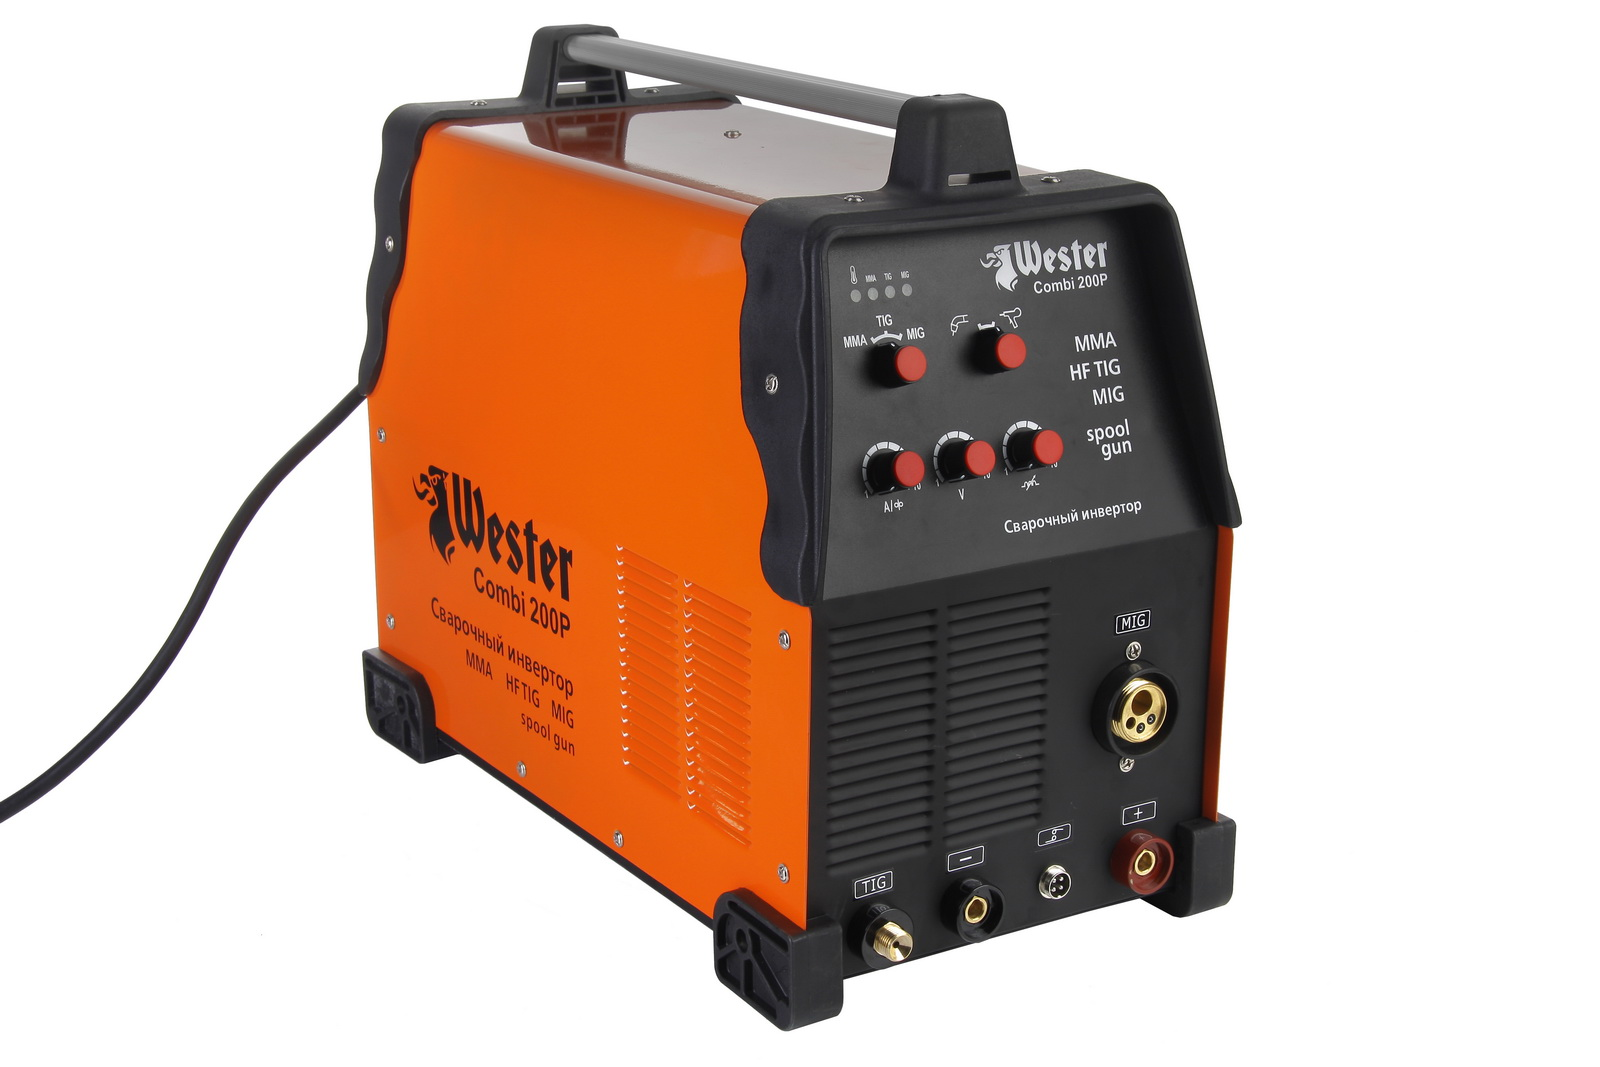 ооо световод нср01-100/ip54-03-led ремонт- схема